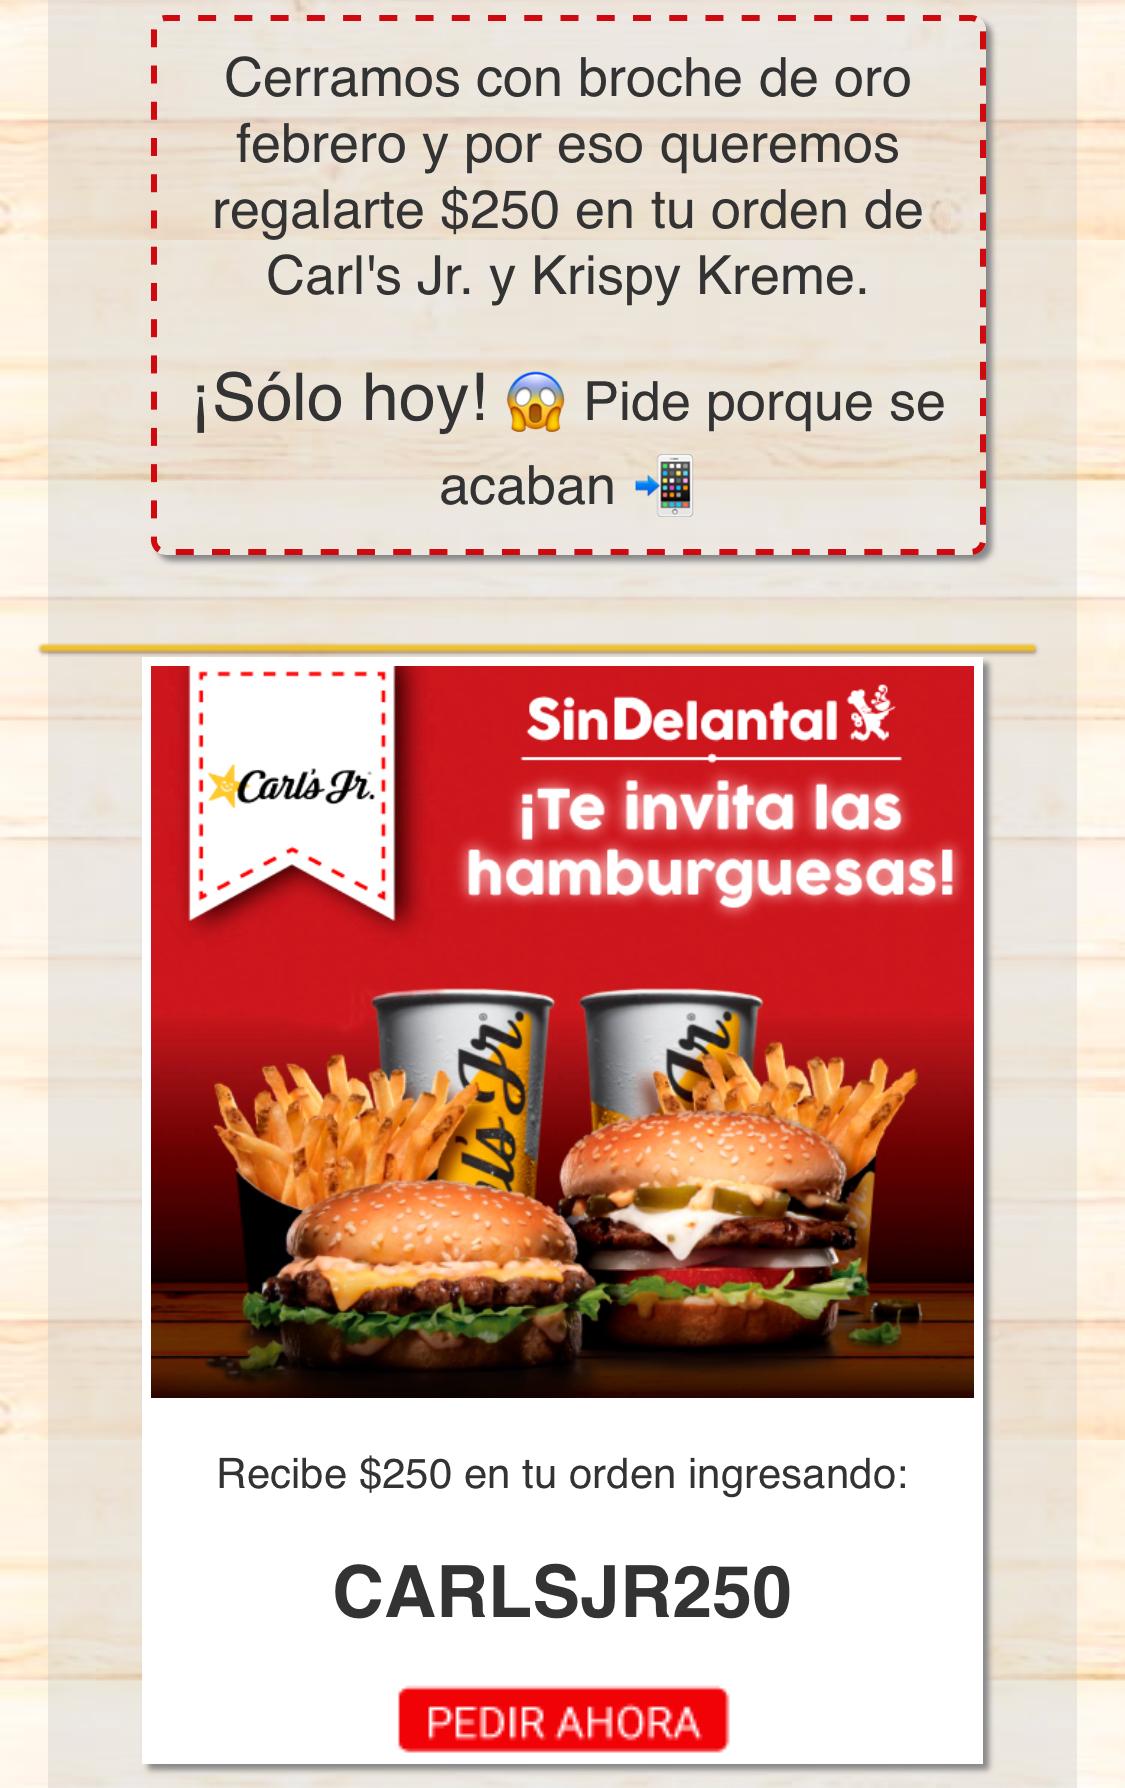 SinDelantal: Cupón $250 de descuento para Carl's Jr. o Krispy Kreme